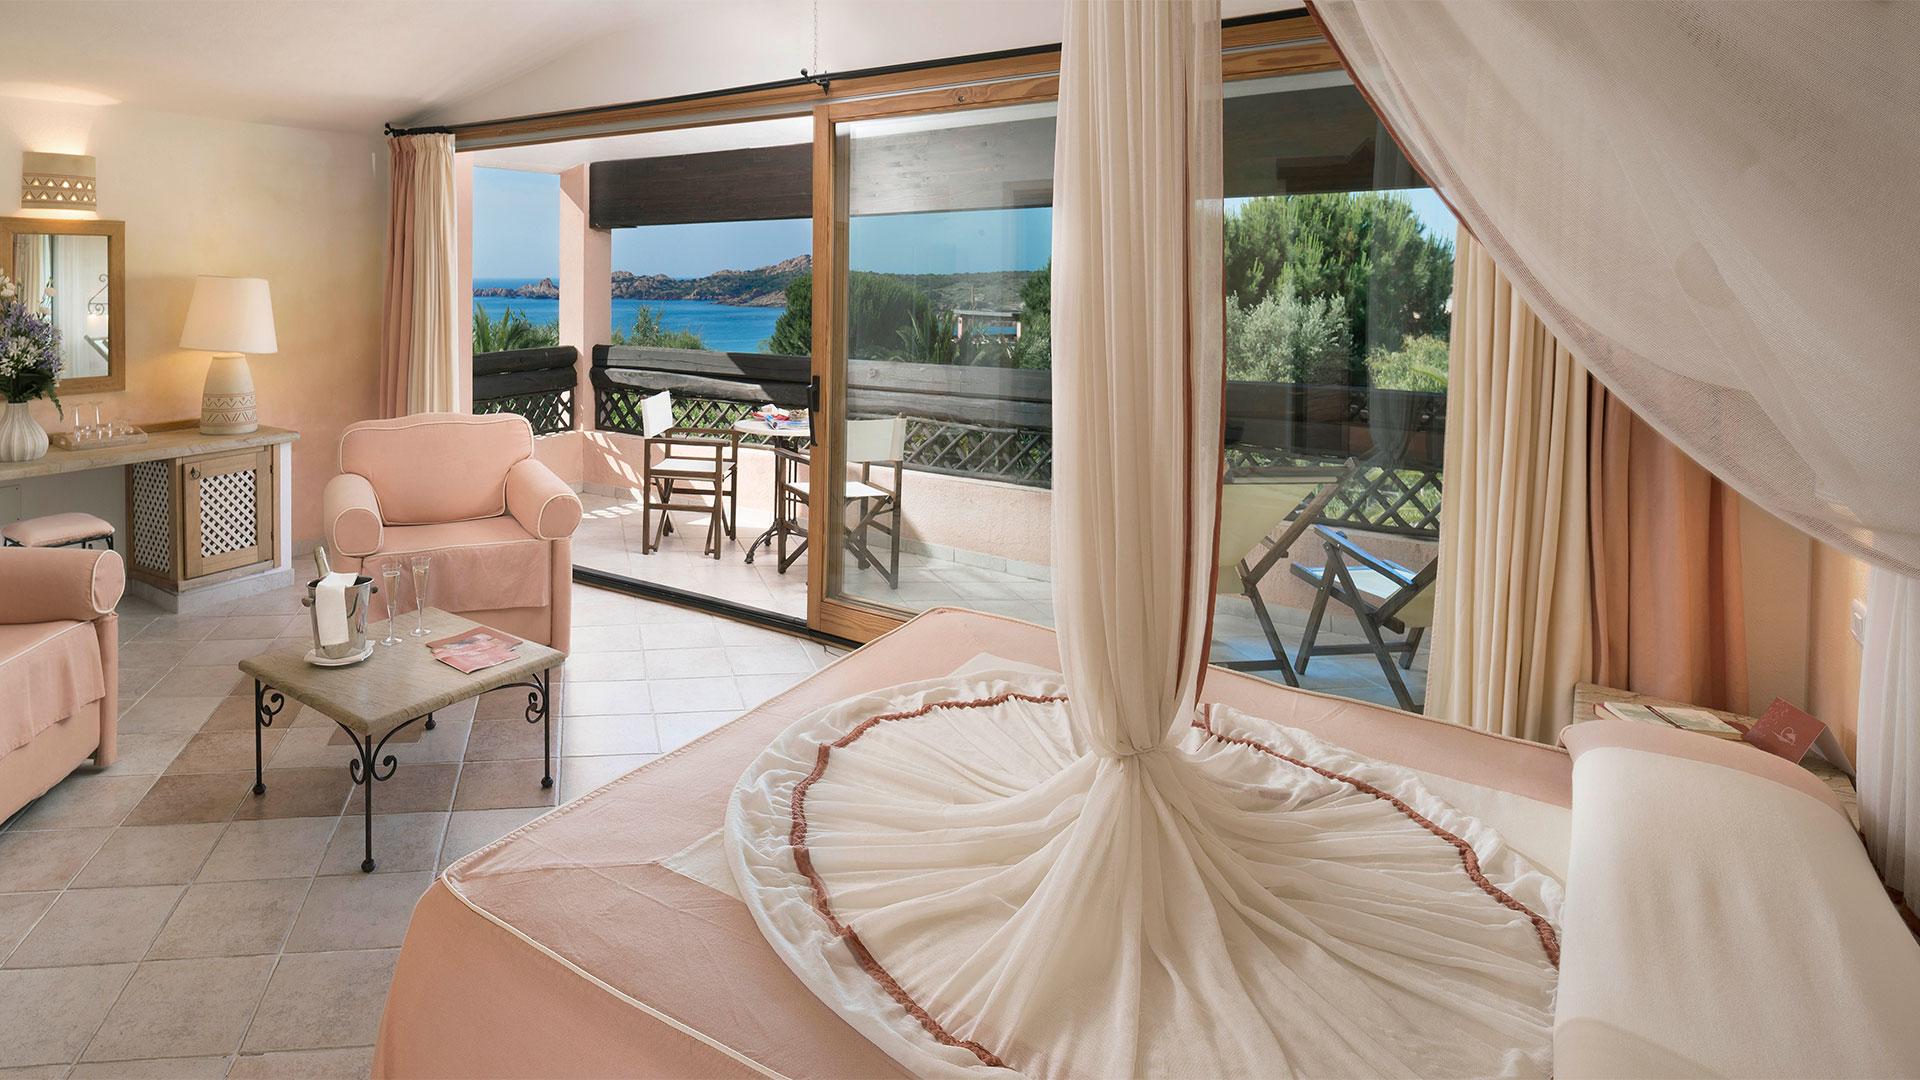 hotel-marinedda-slider-camere-royal-suite-mare-2